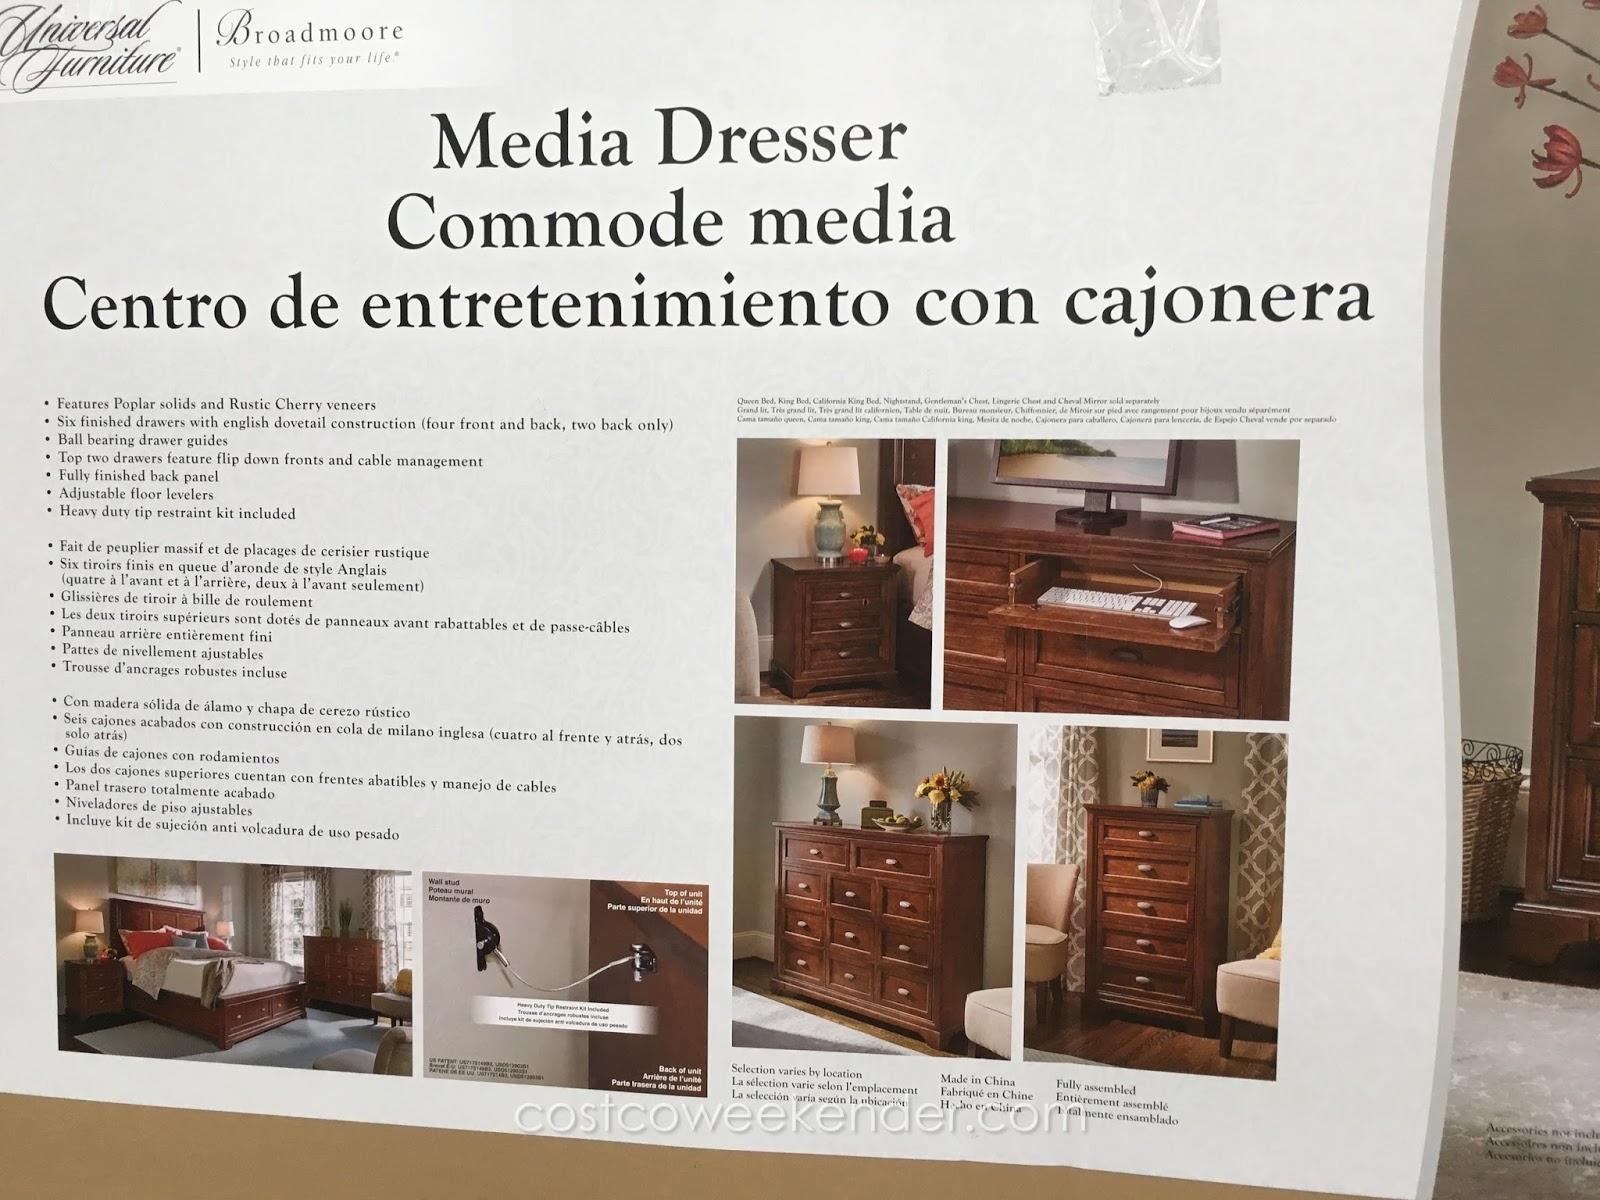 Media Dresser Costco Bestdressers 2019